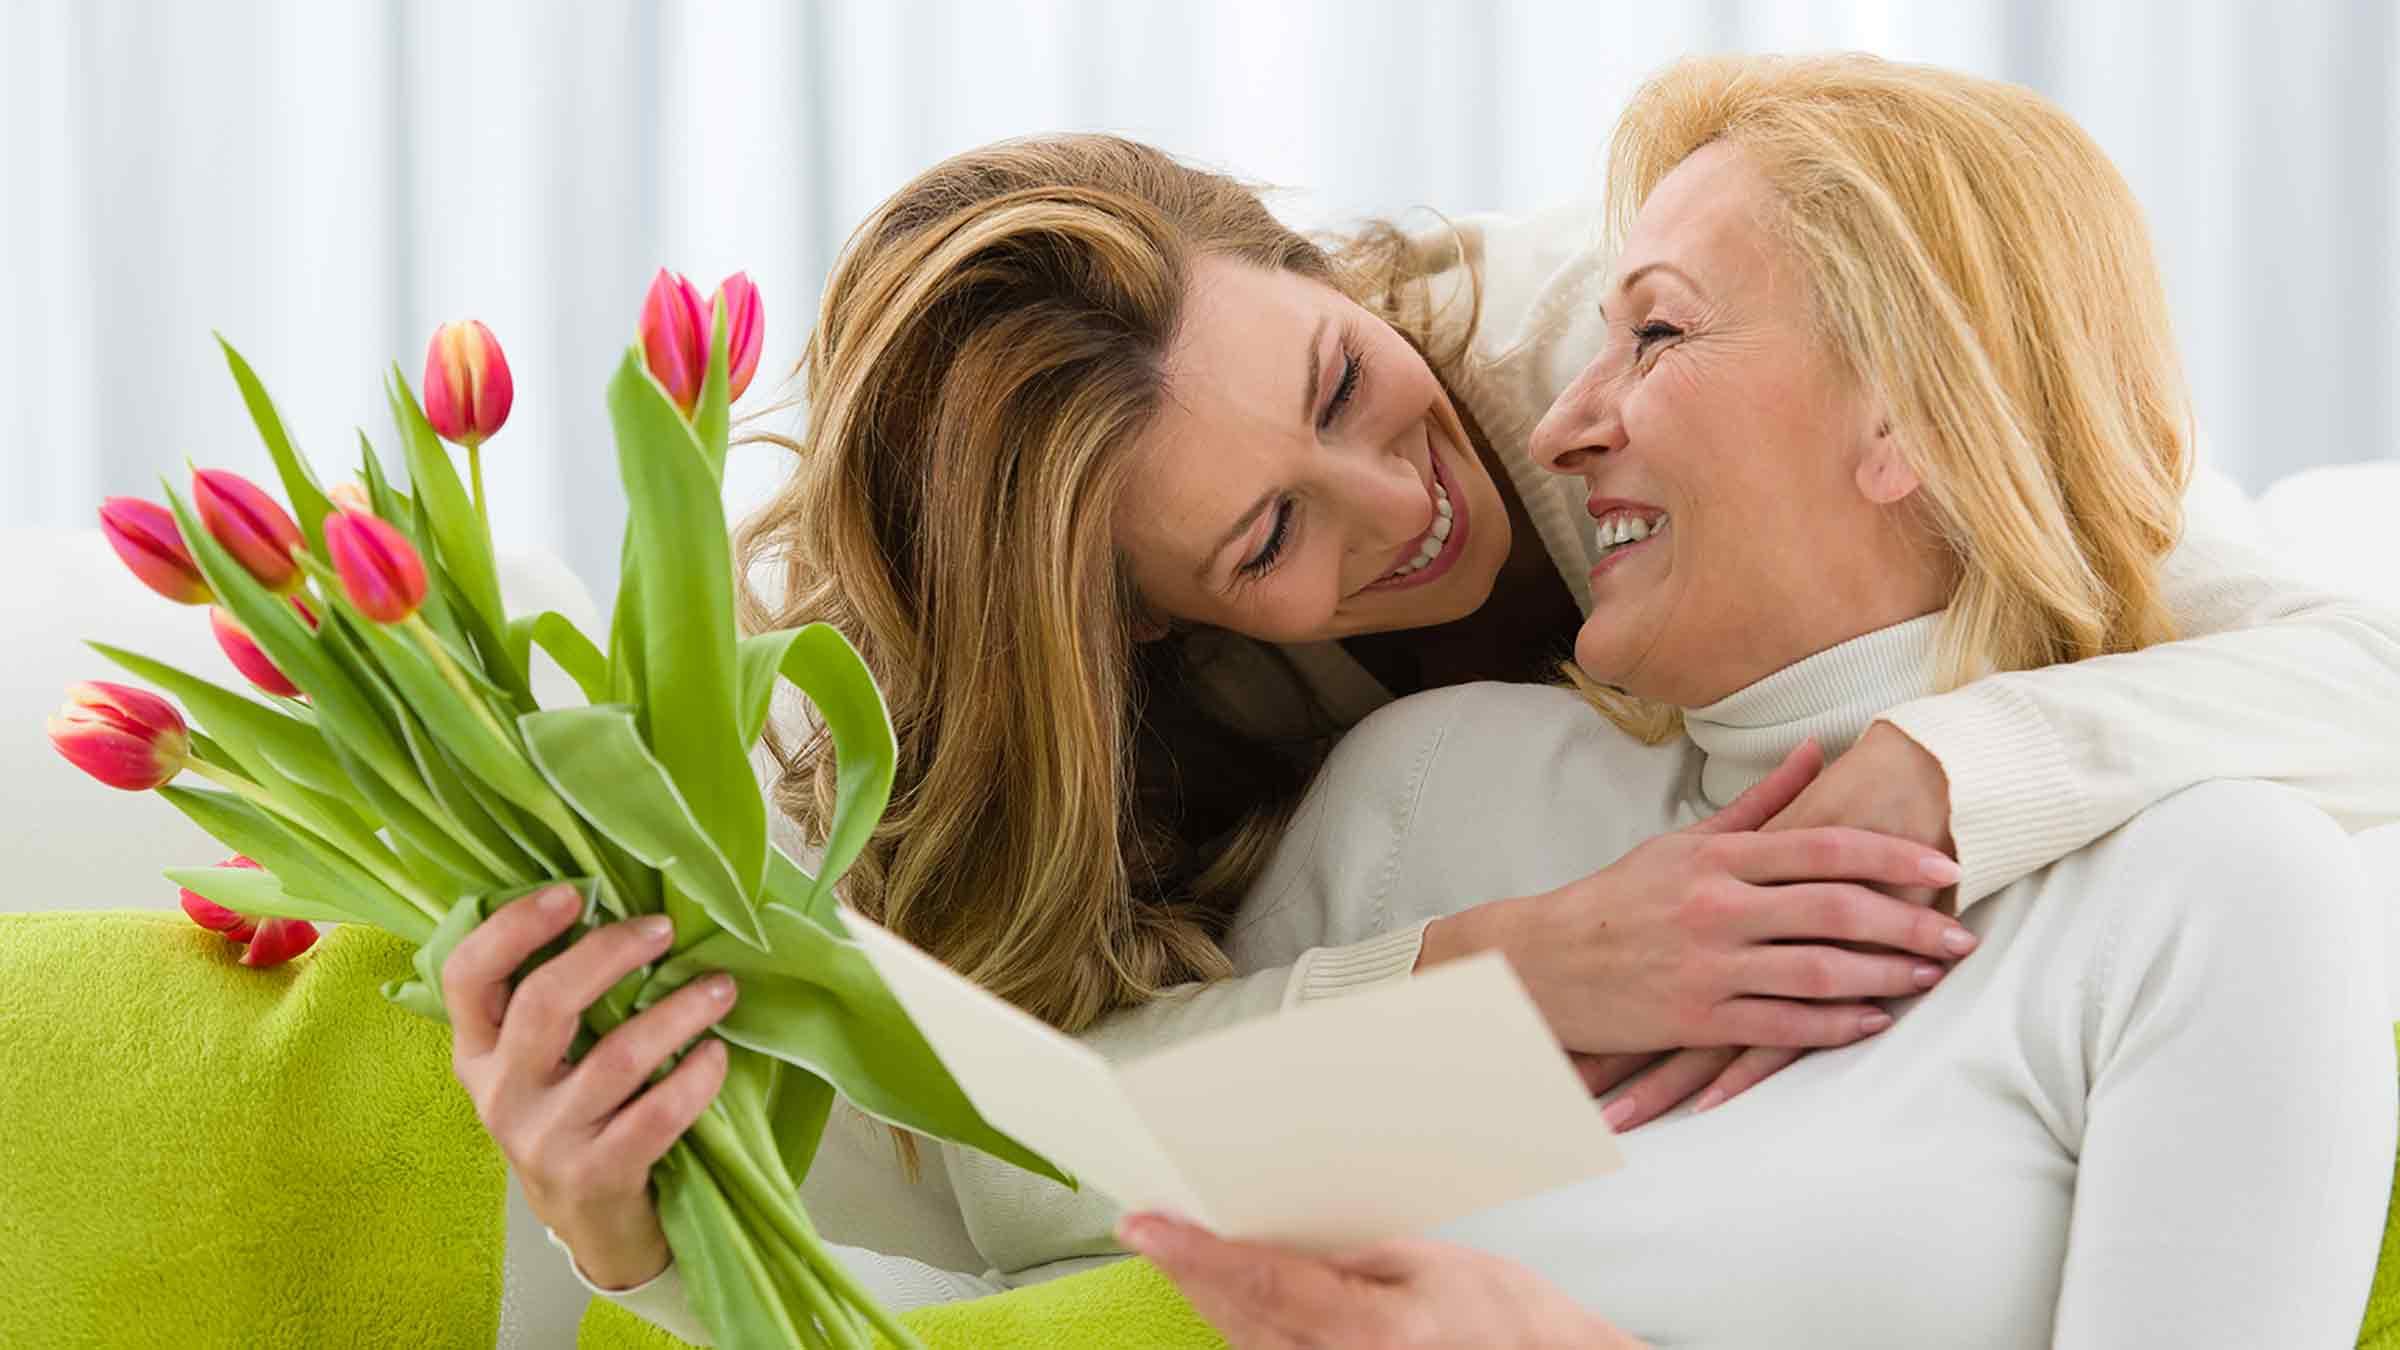 Девушка дарит цветы (тюльпаны) женщина